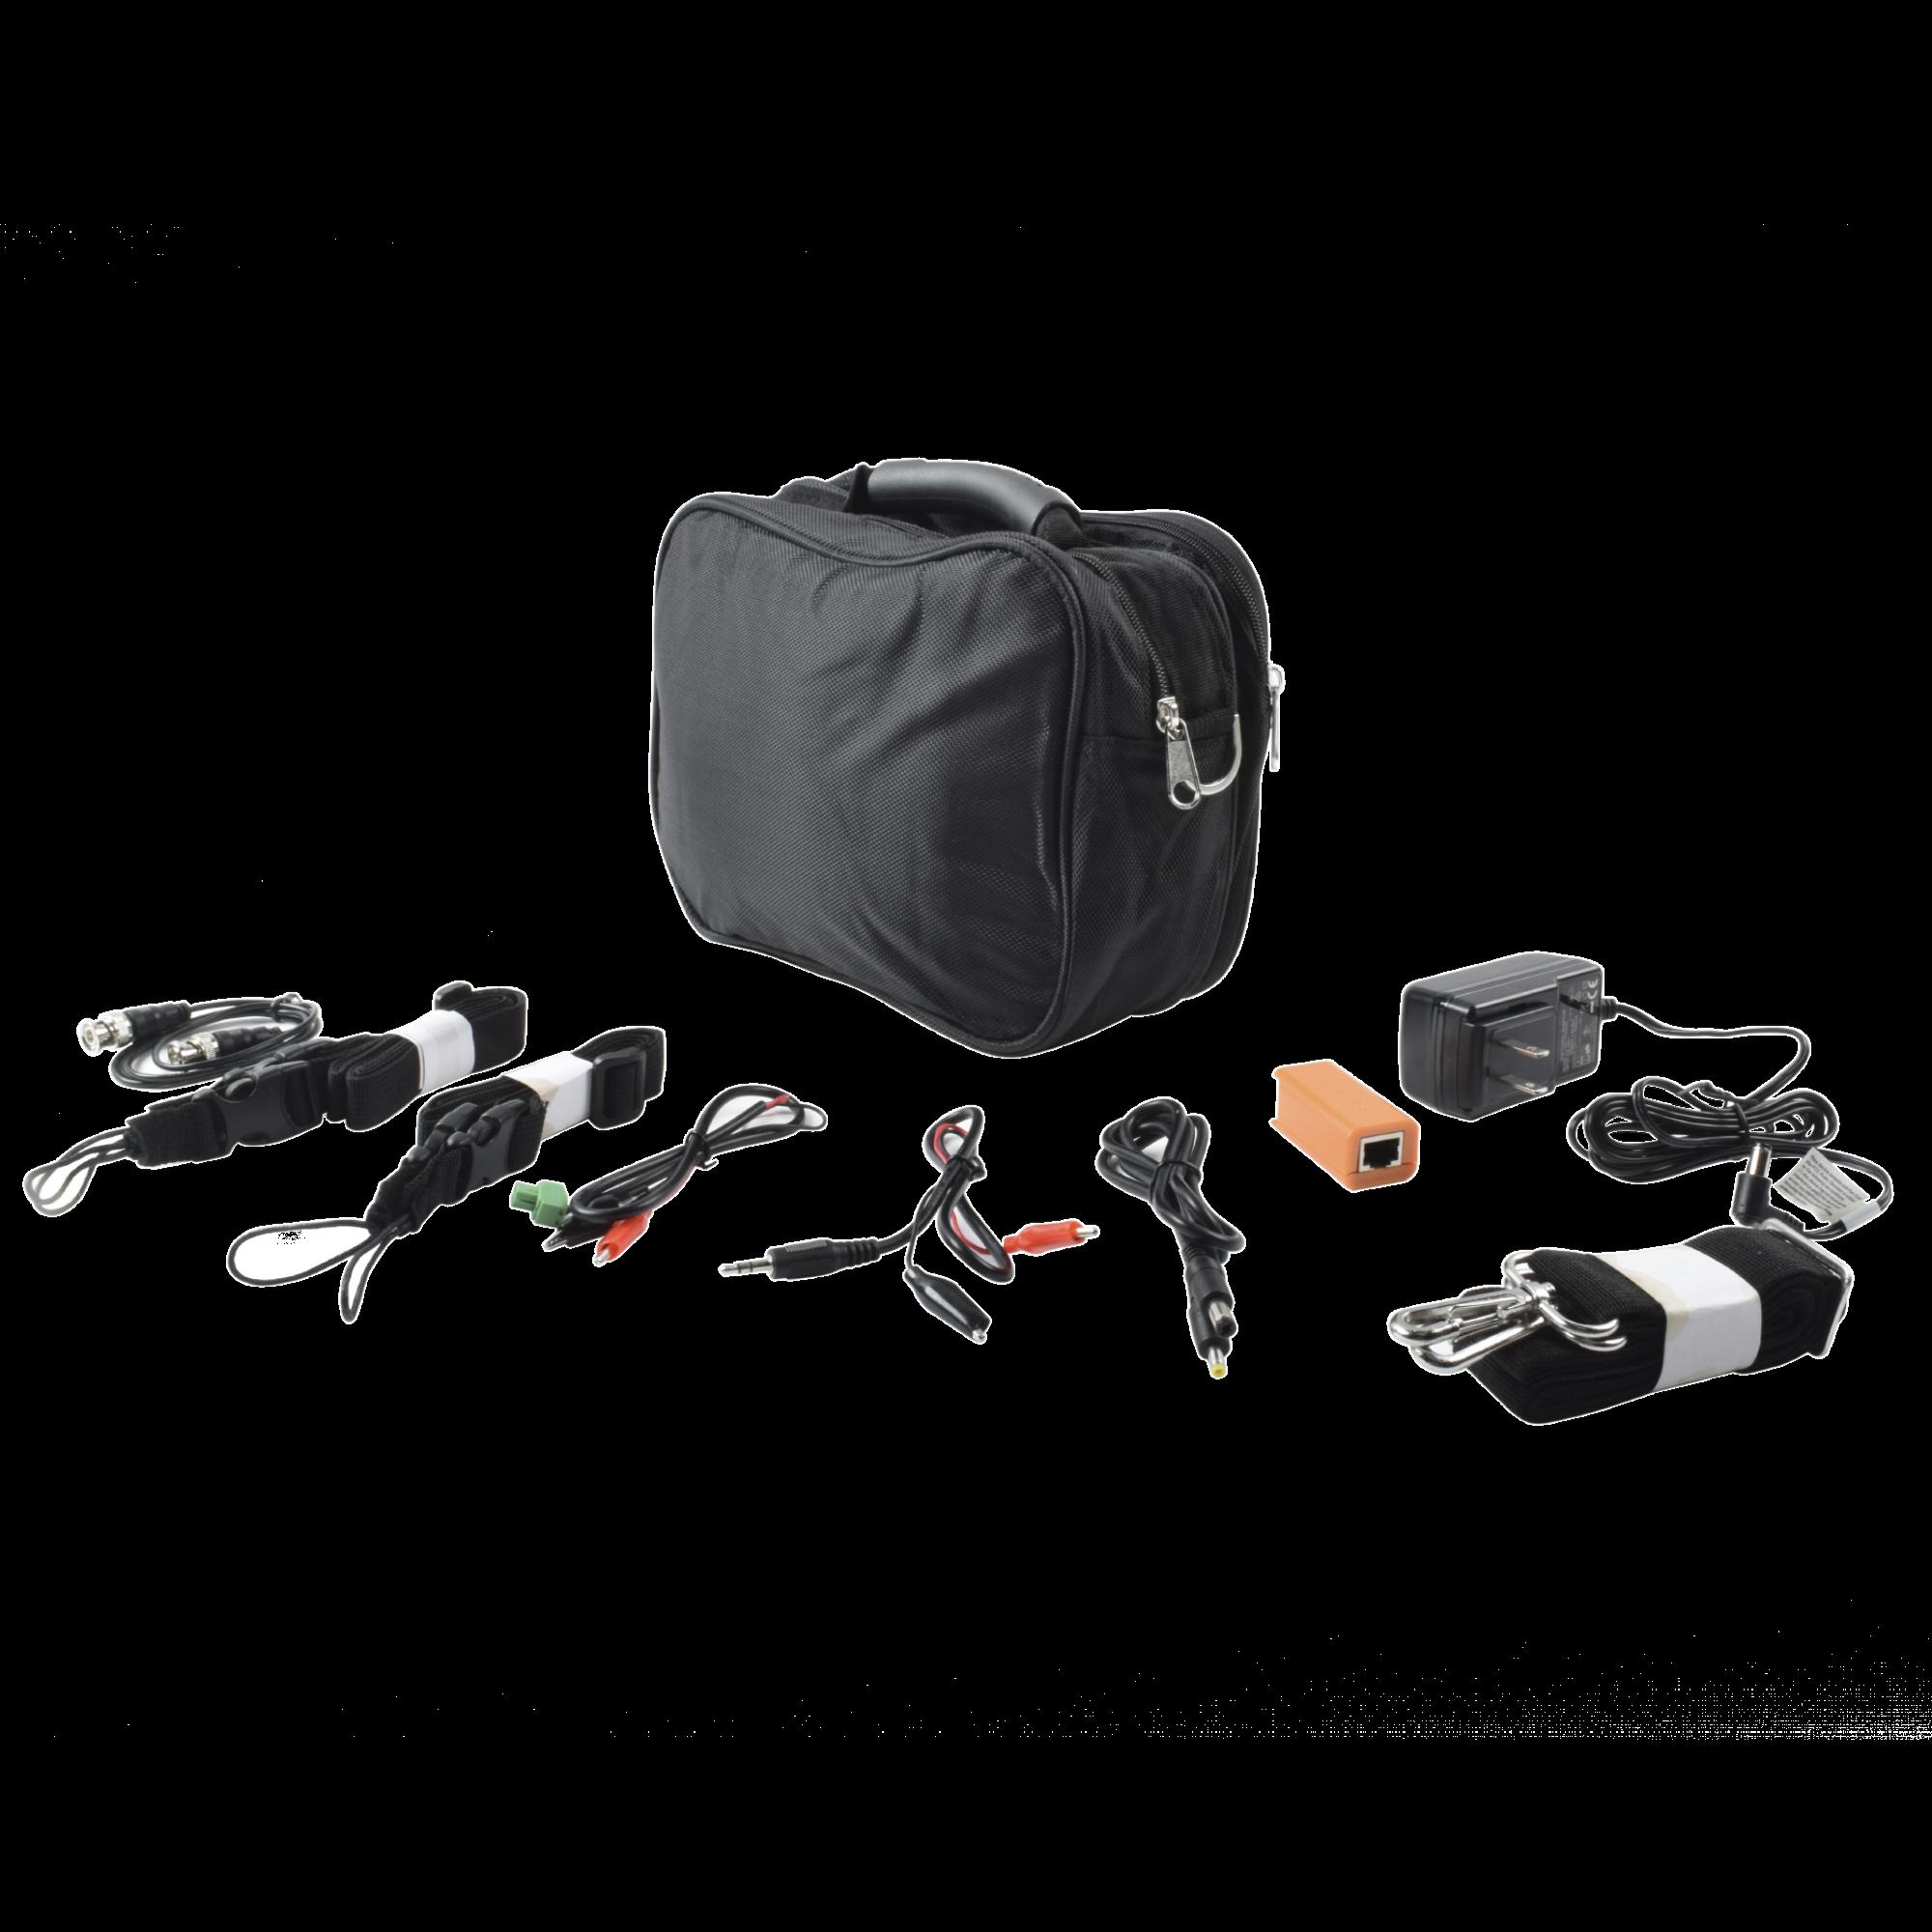 Kit de accesorios para probadores de video TPTURBO5MP,TPTURBO8MP, TPTURBOHD